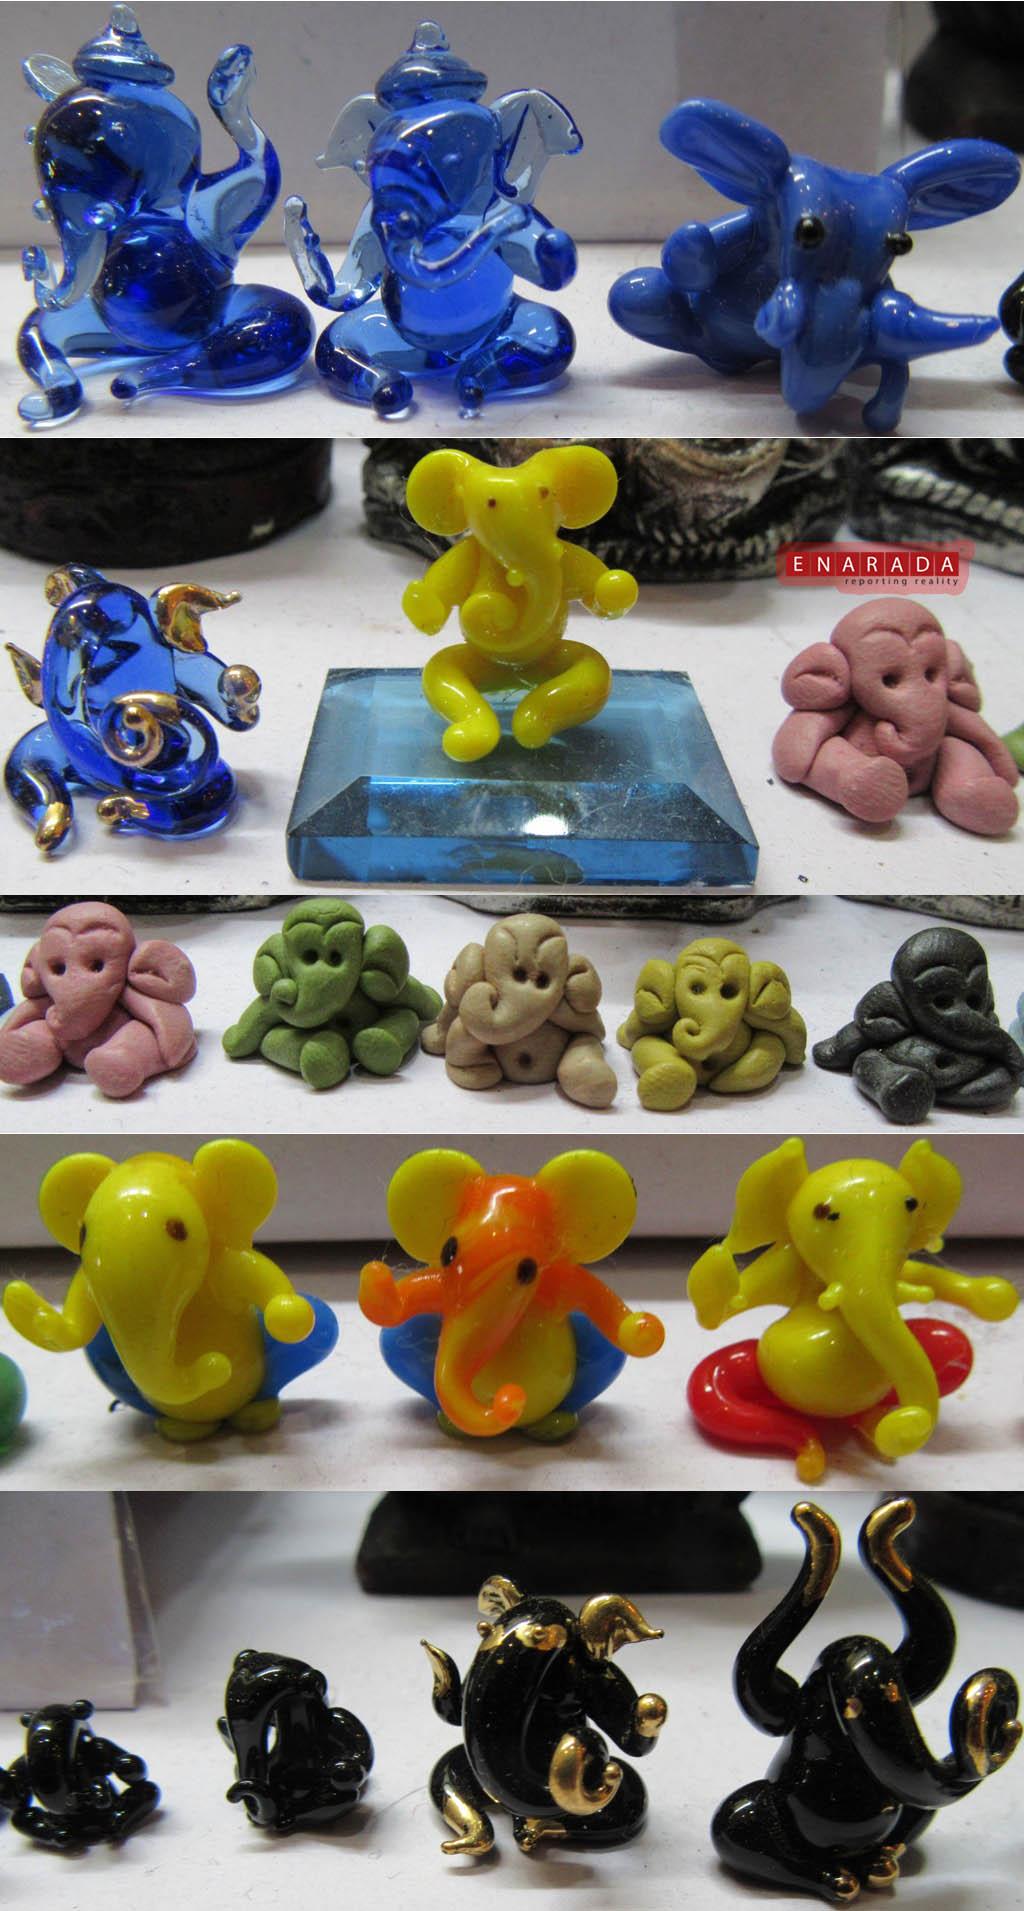 Ganesha Idols 2. eNarada Pictures